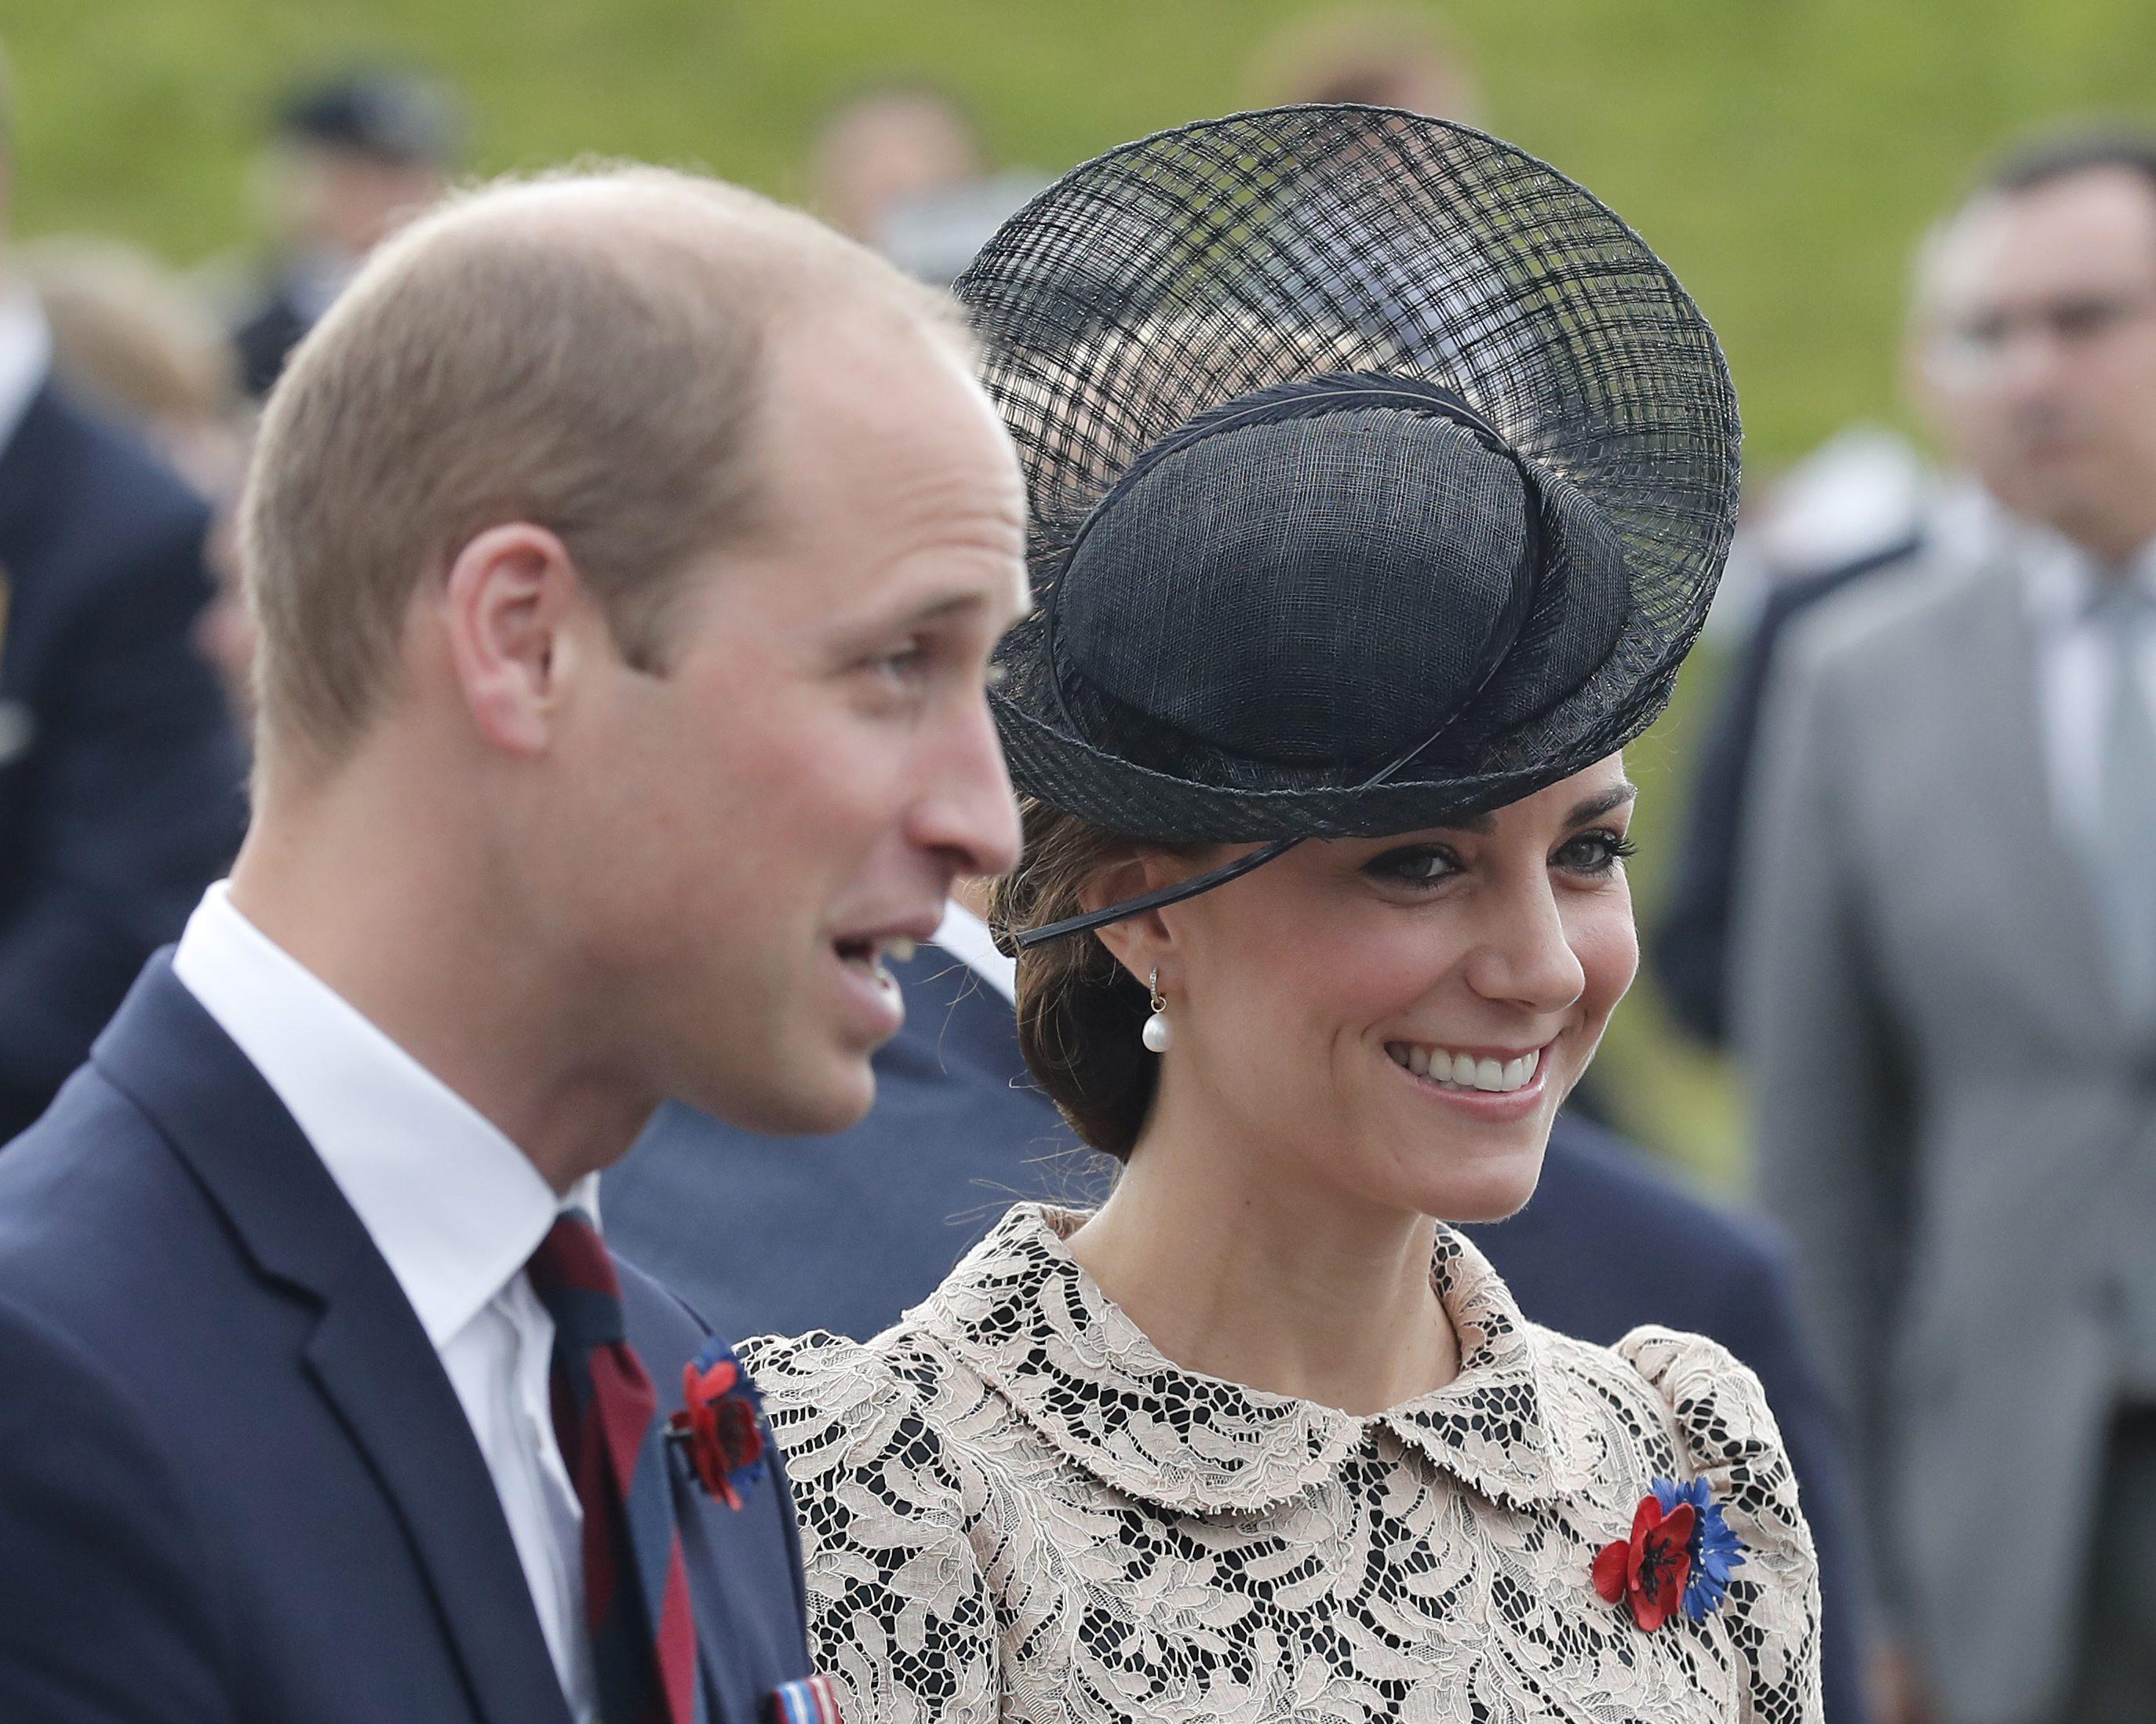 Kate Middleton ha partorito, è nato il terzo Royal Baby